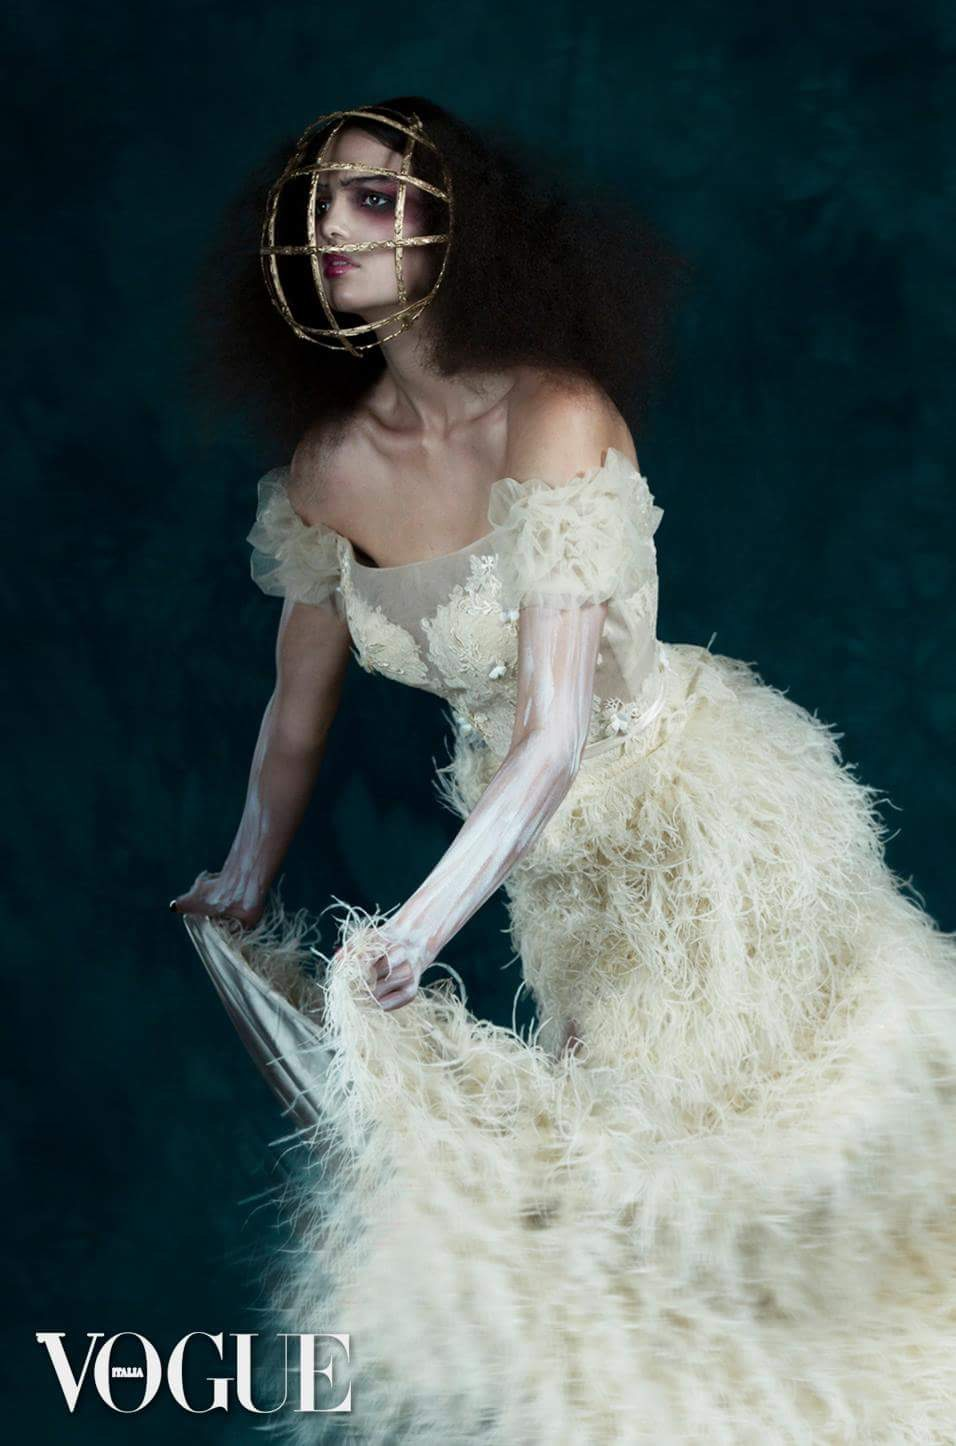 Photographer - Lori Cicchini / Vogue Italia